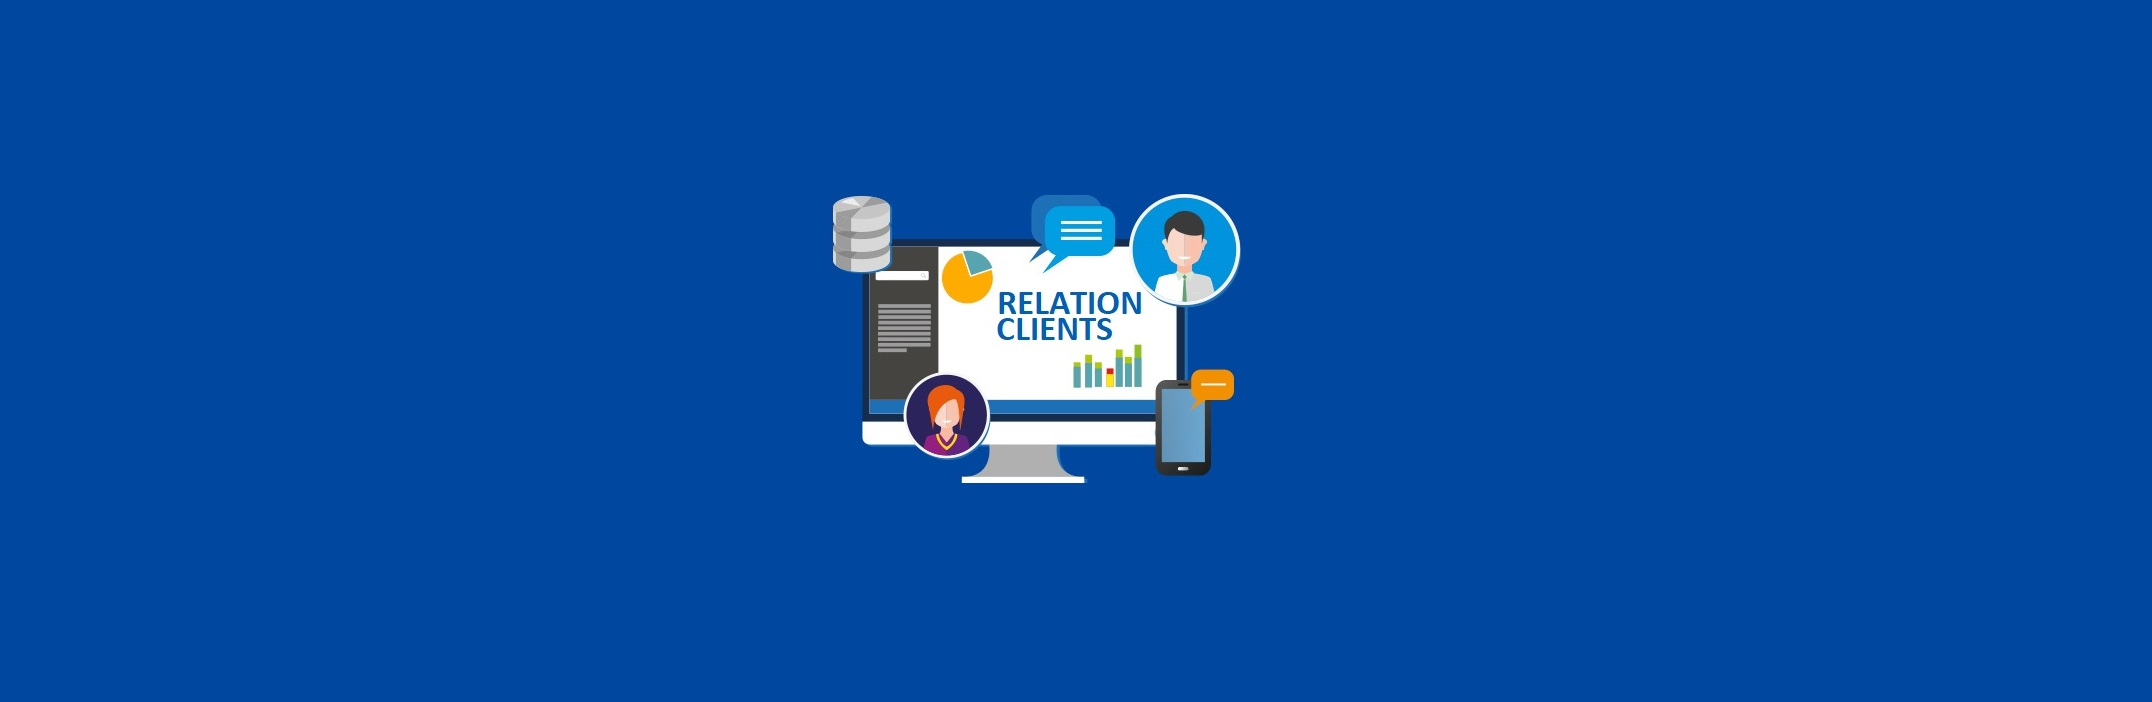 myrezapp-rdv-en-ligne-relation-clients